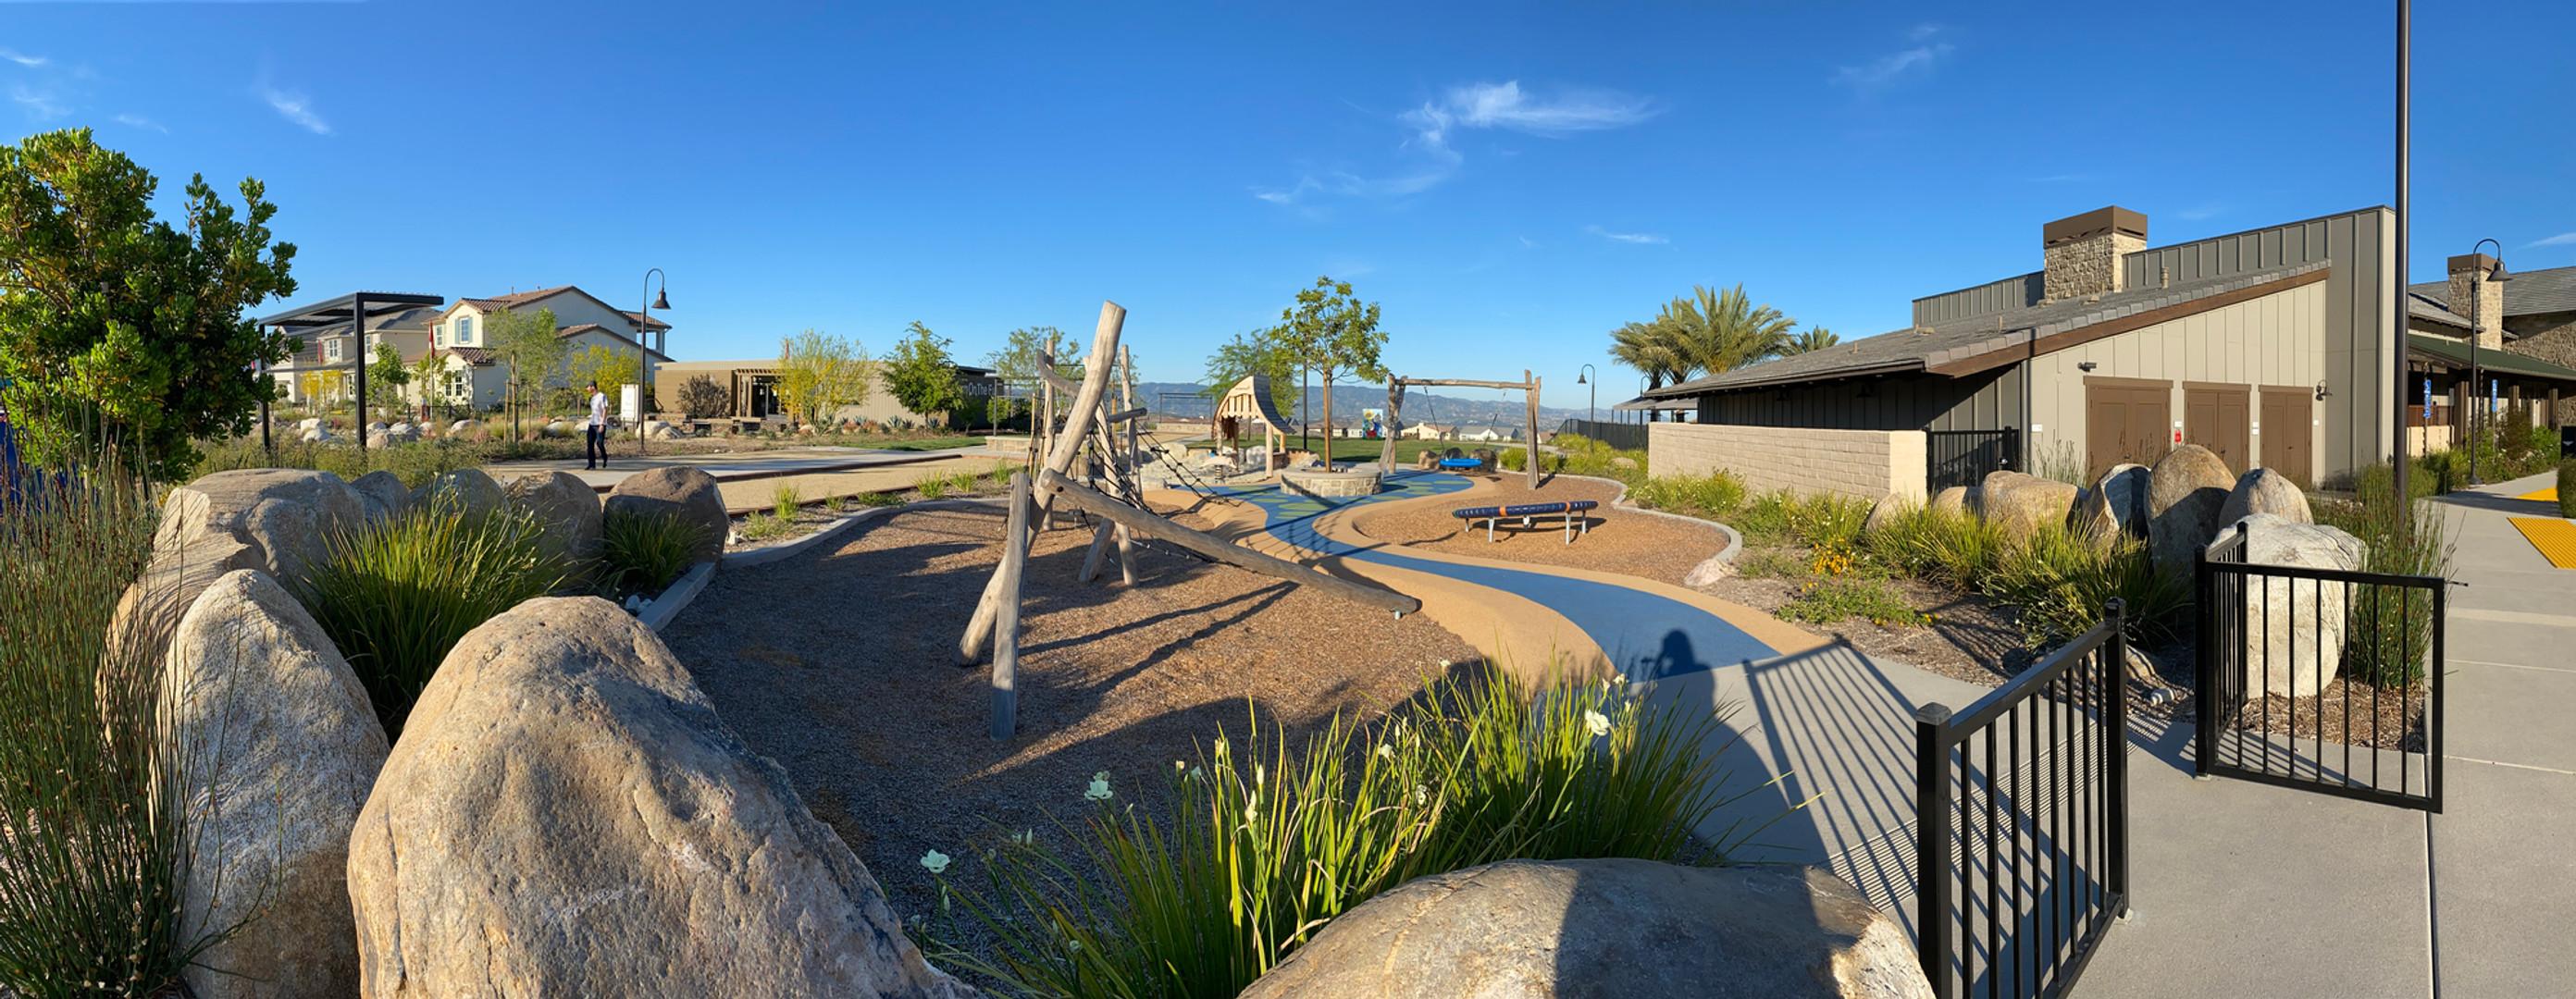 Boulder playground wall